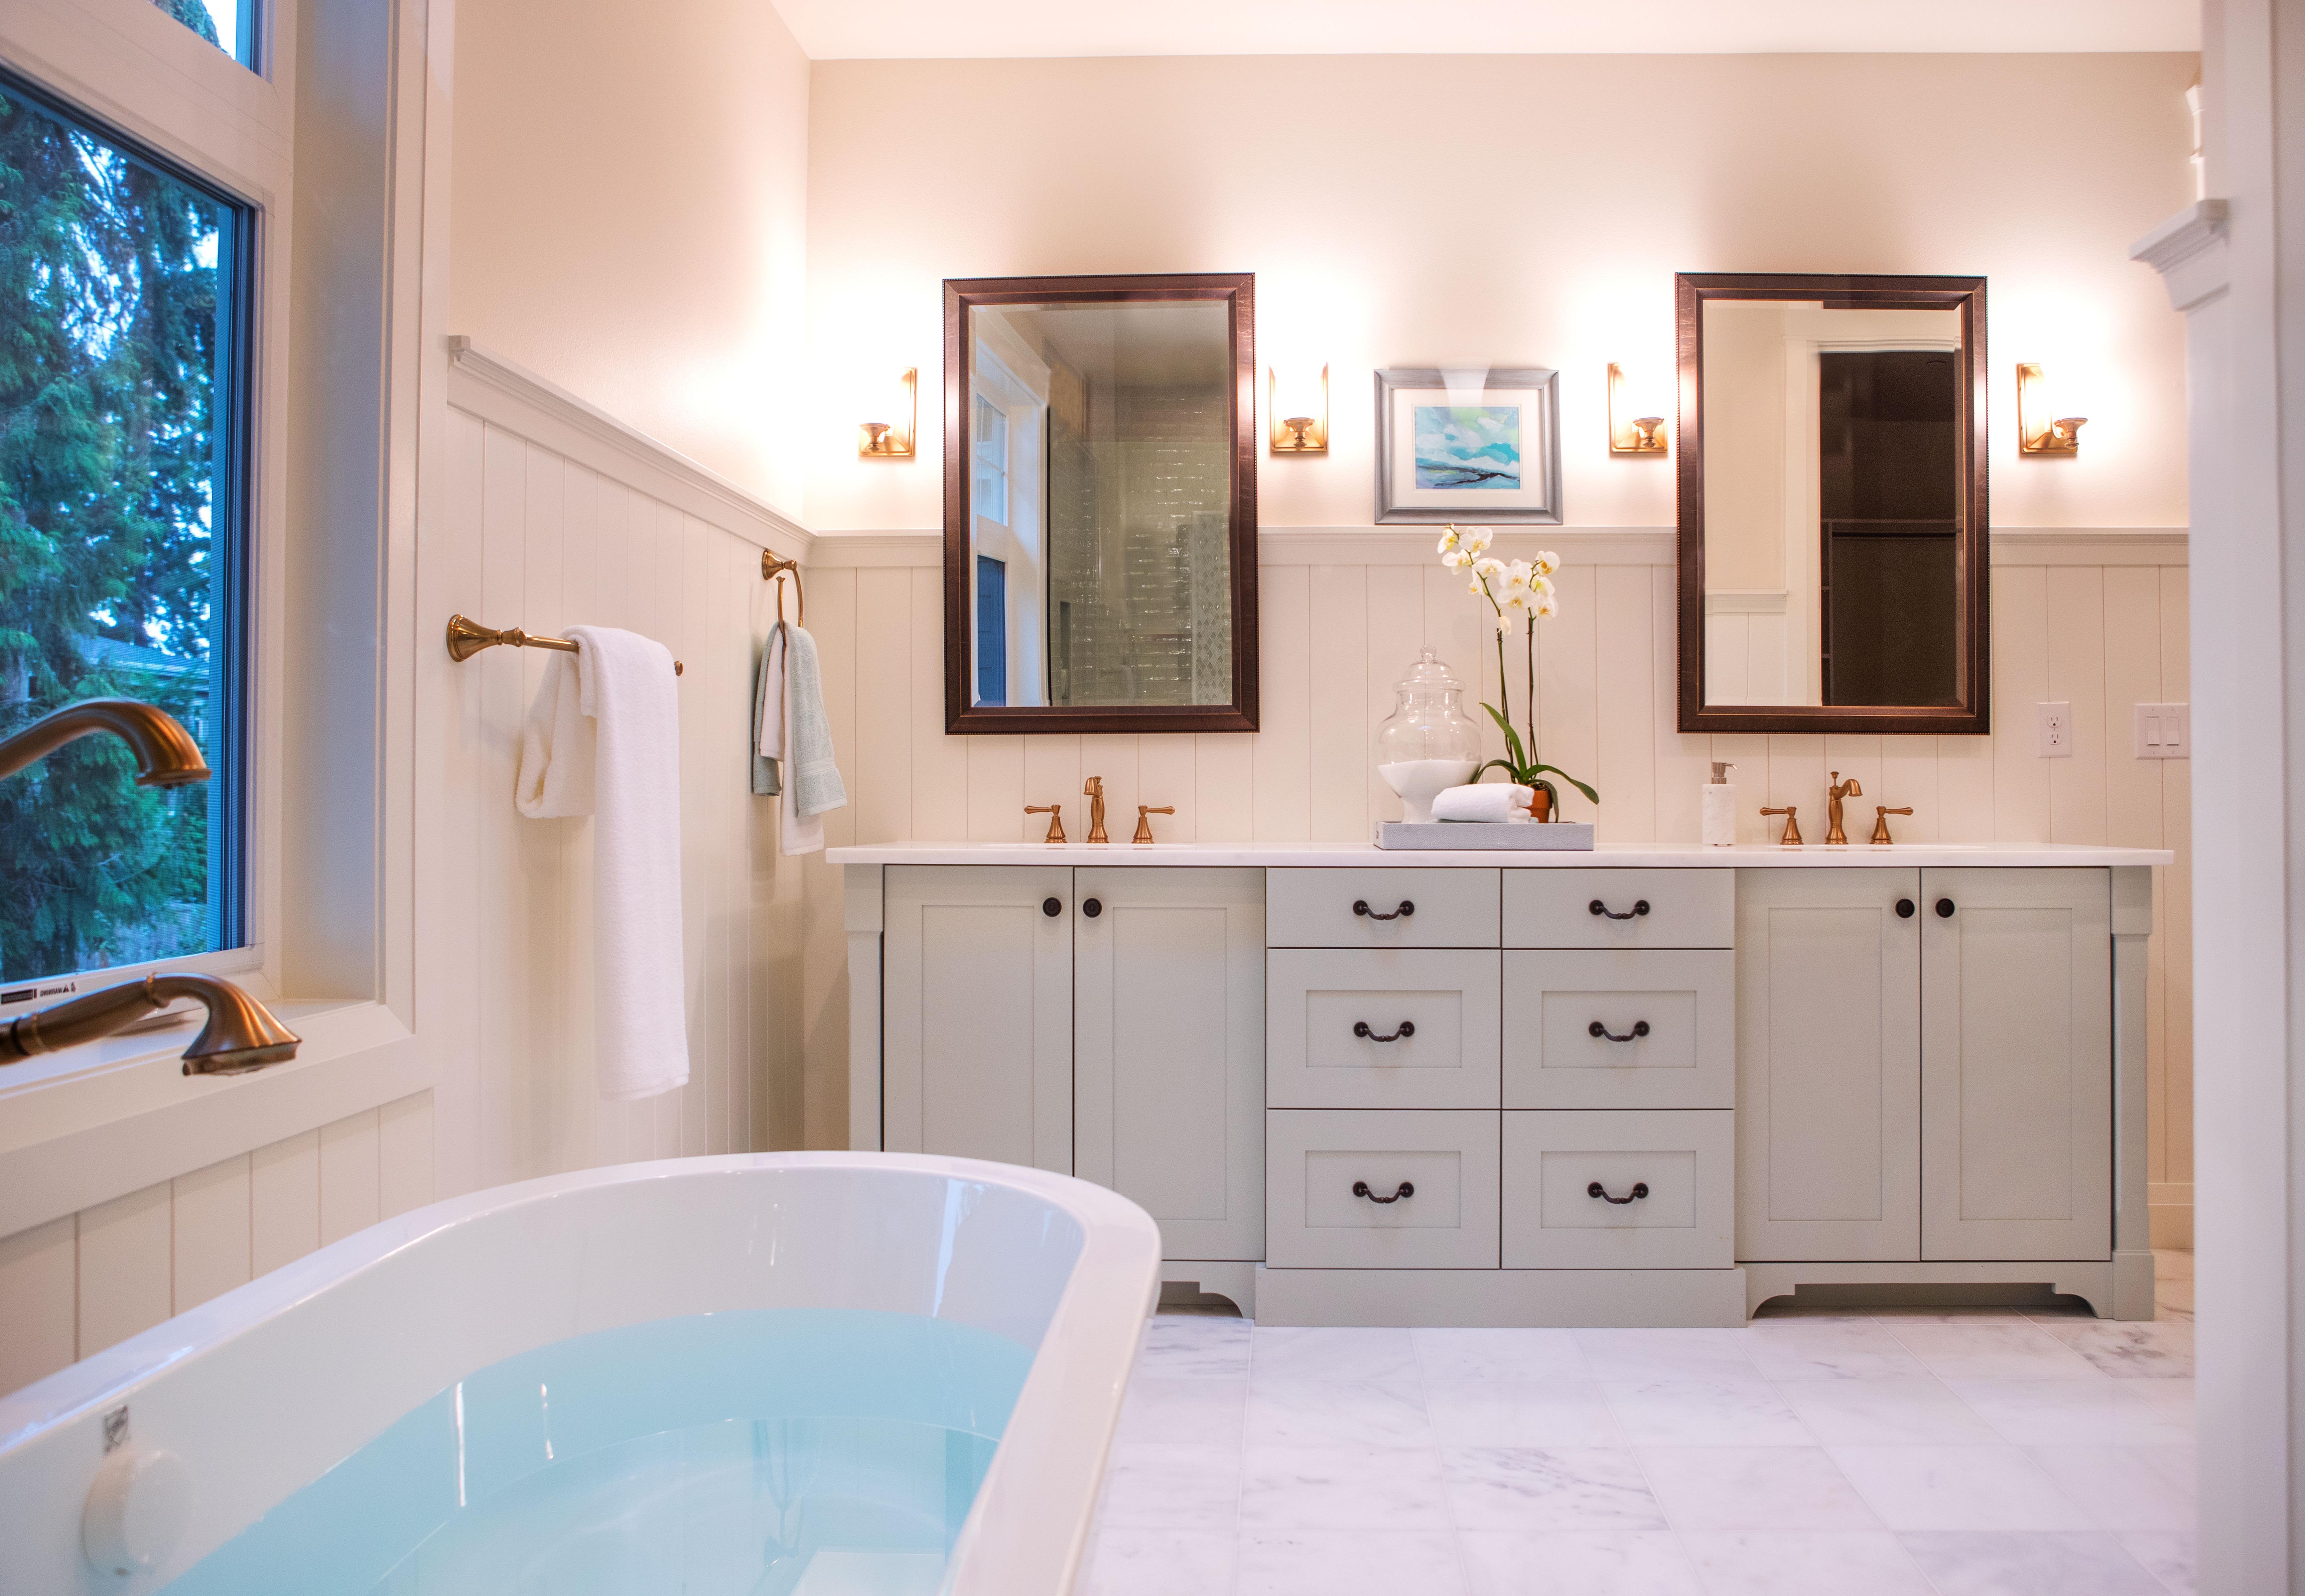 Surprising Bathroom Remodeling Design Guide Pictures